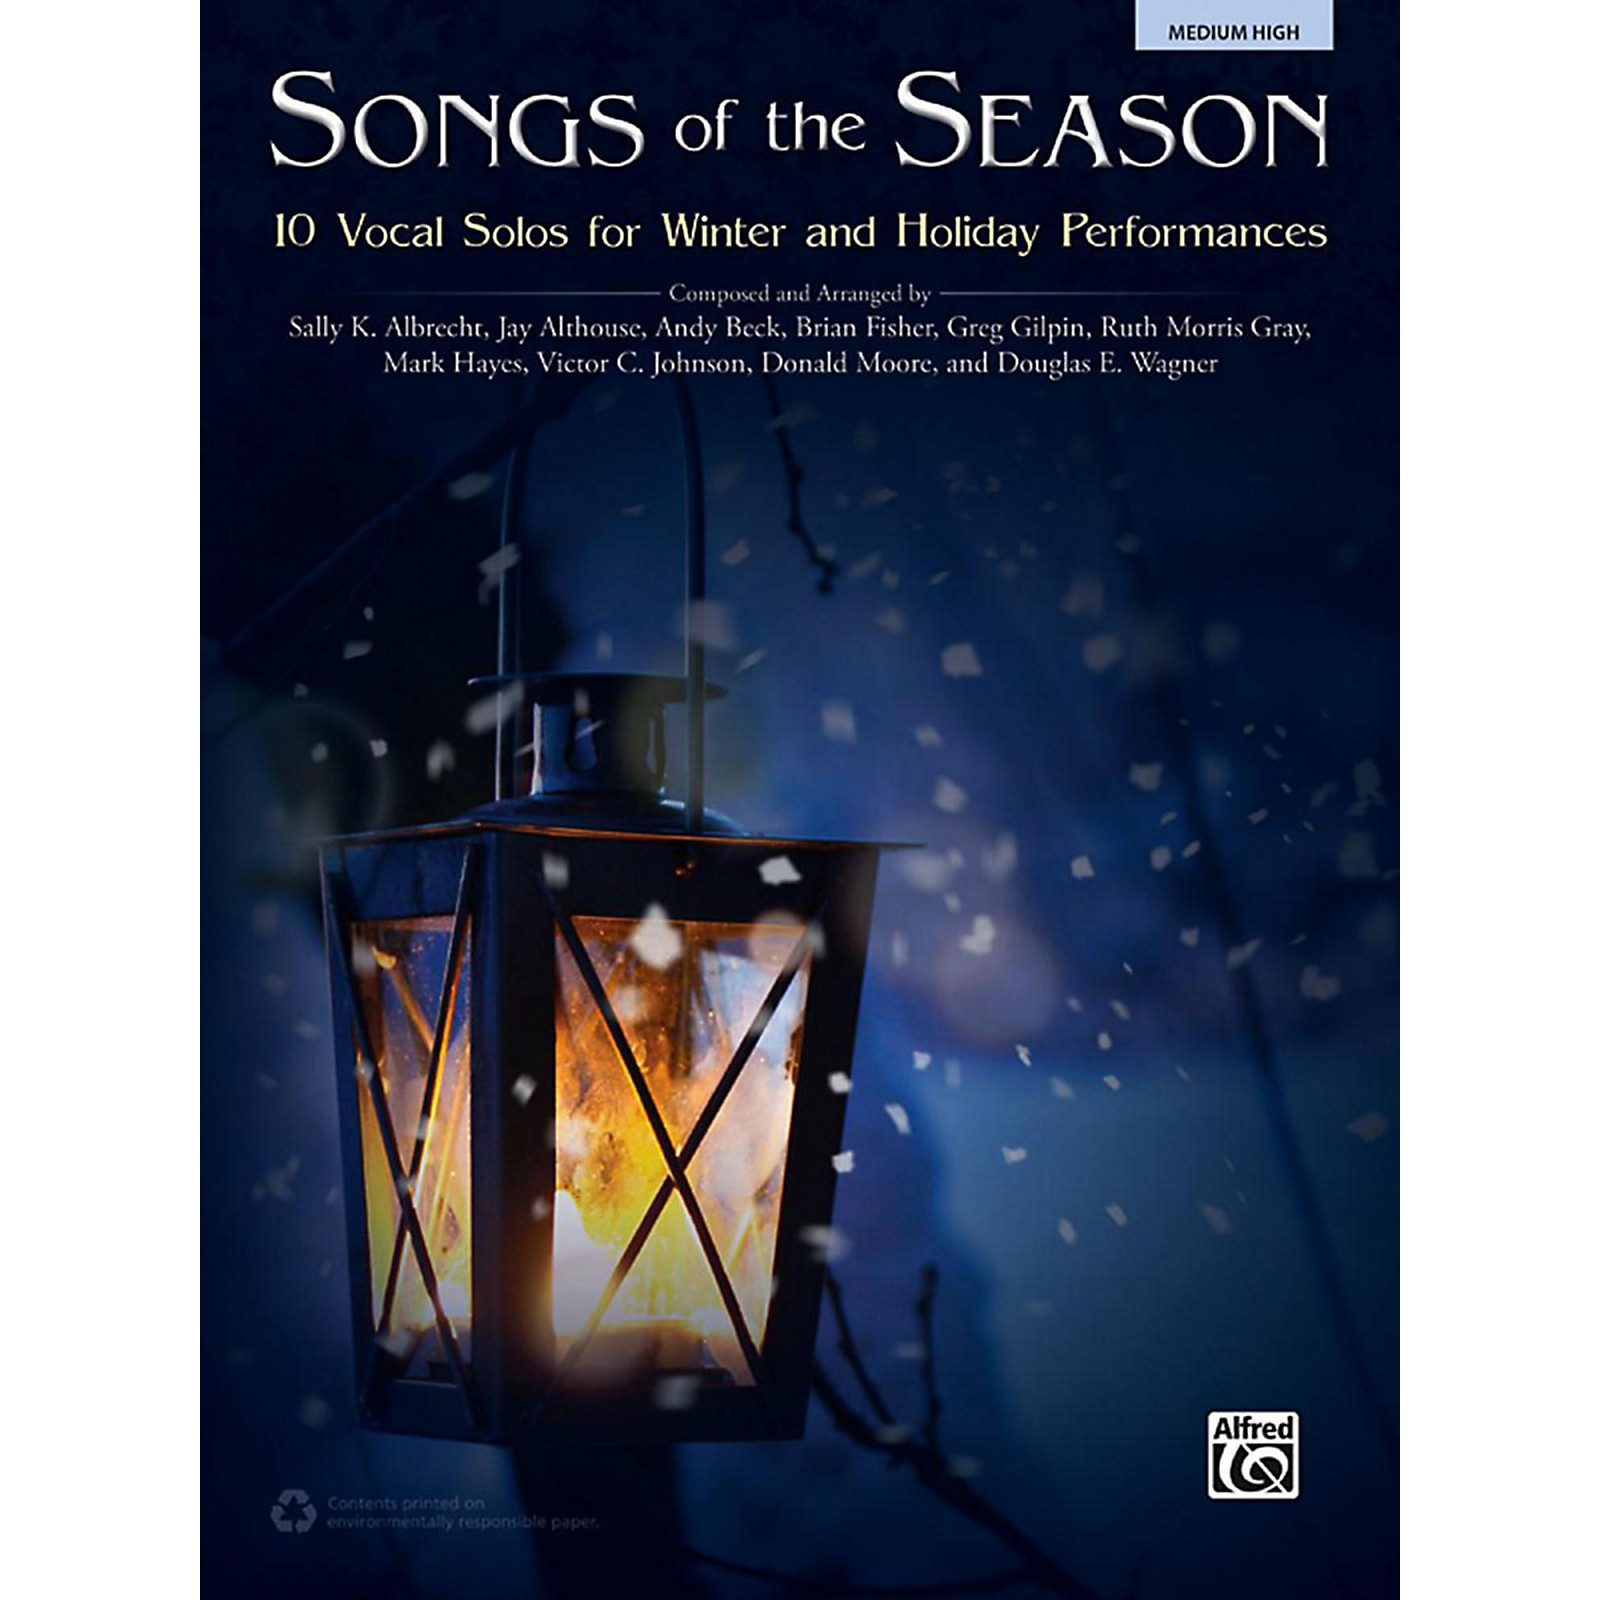 Alfred Songs of the Season Medium High Acc. CD